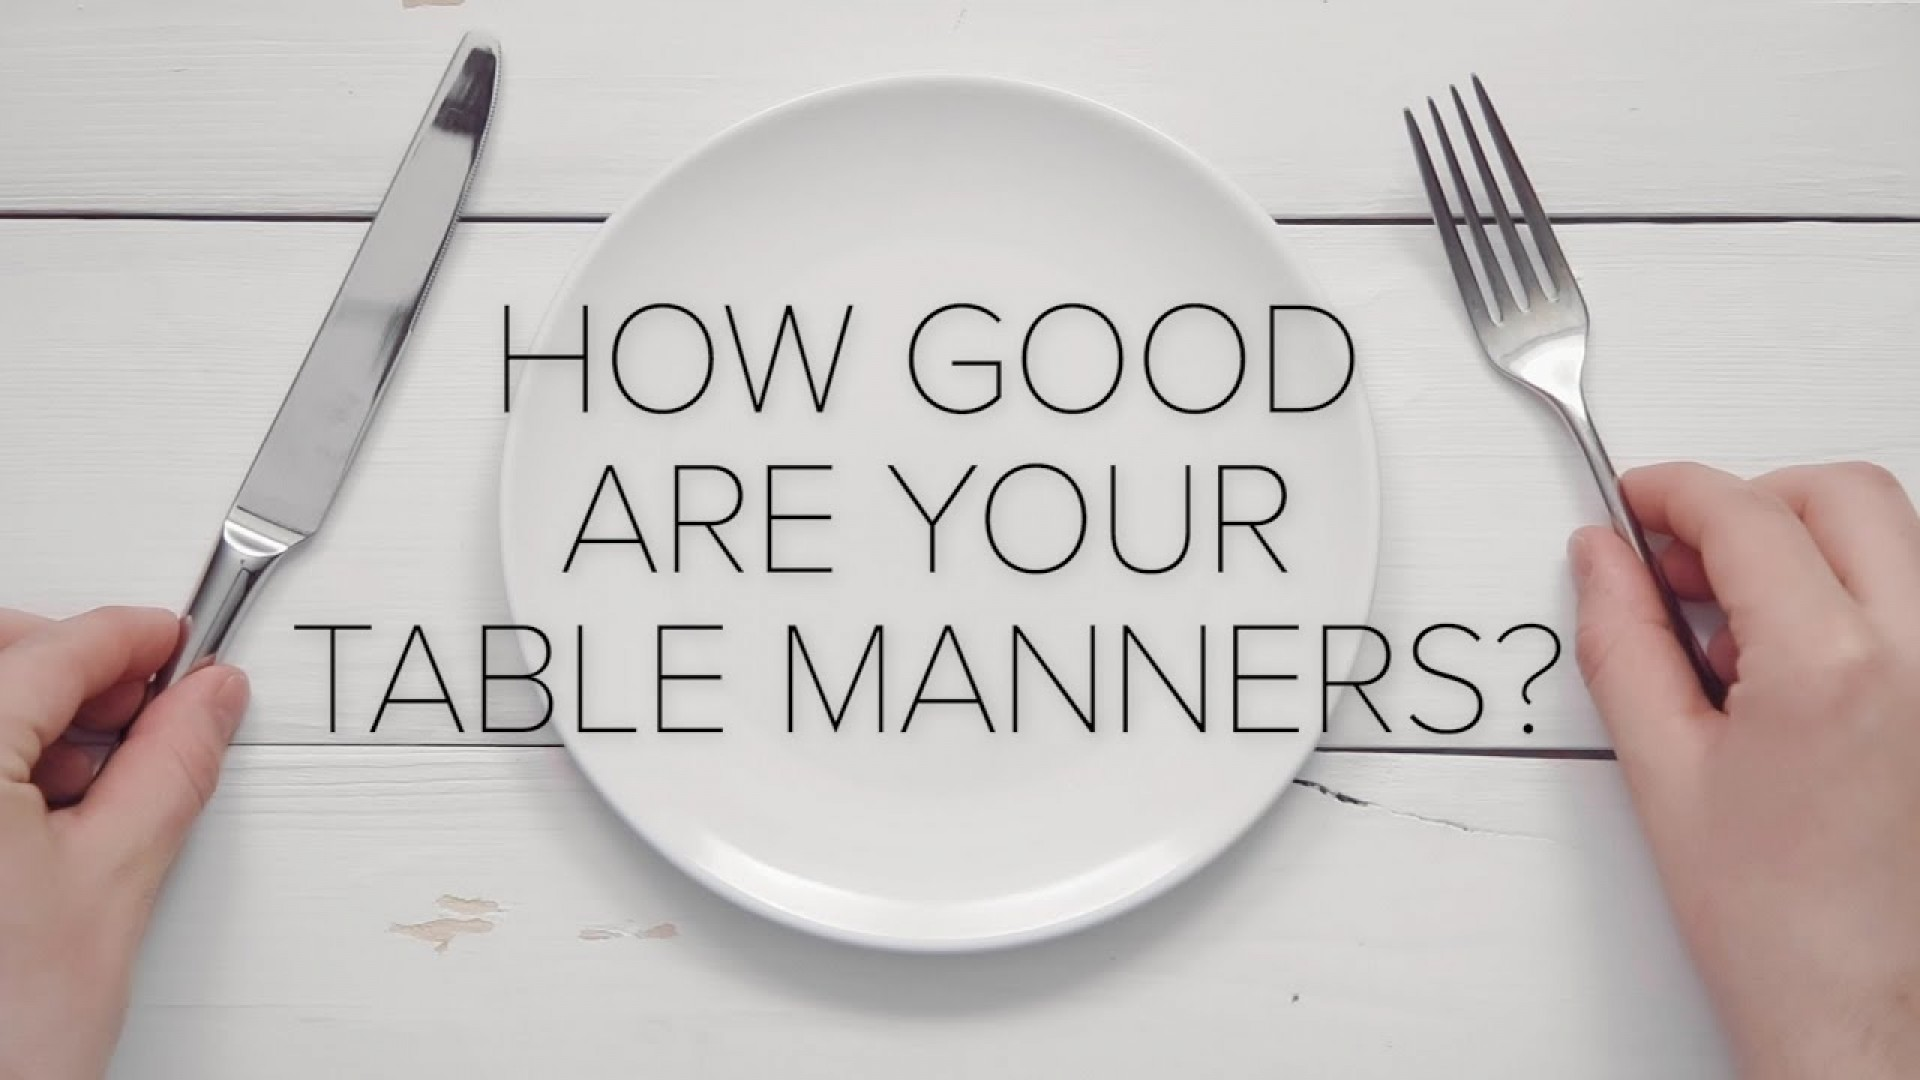 012 Basic Table Manners Essay Maxresdefault Wonderful 1920